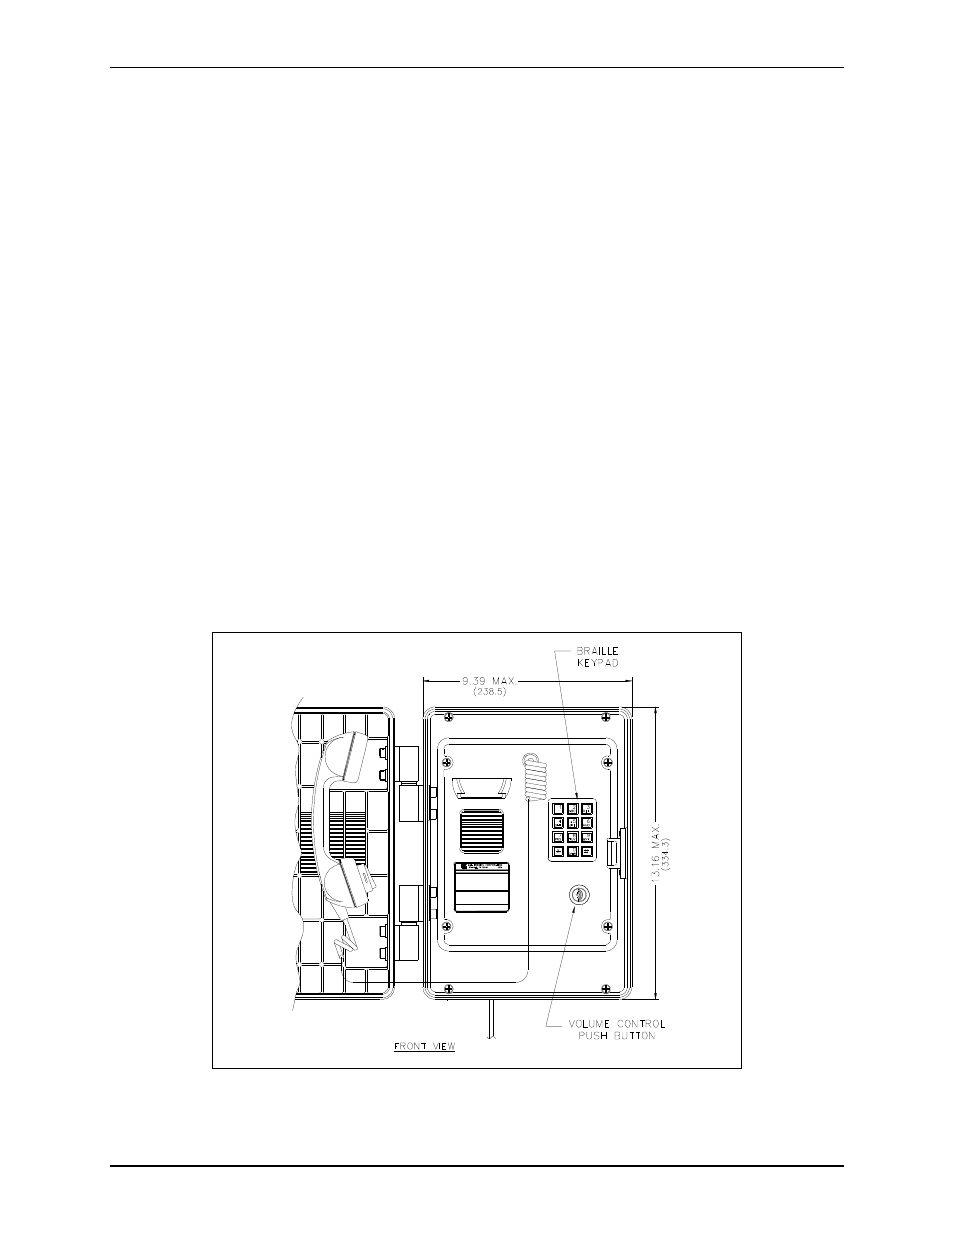 Model 256-700 | GAI-Tronics 226-700 Hanset VoIP Telephones ... on